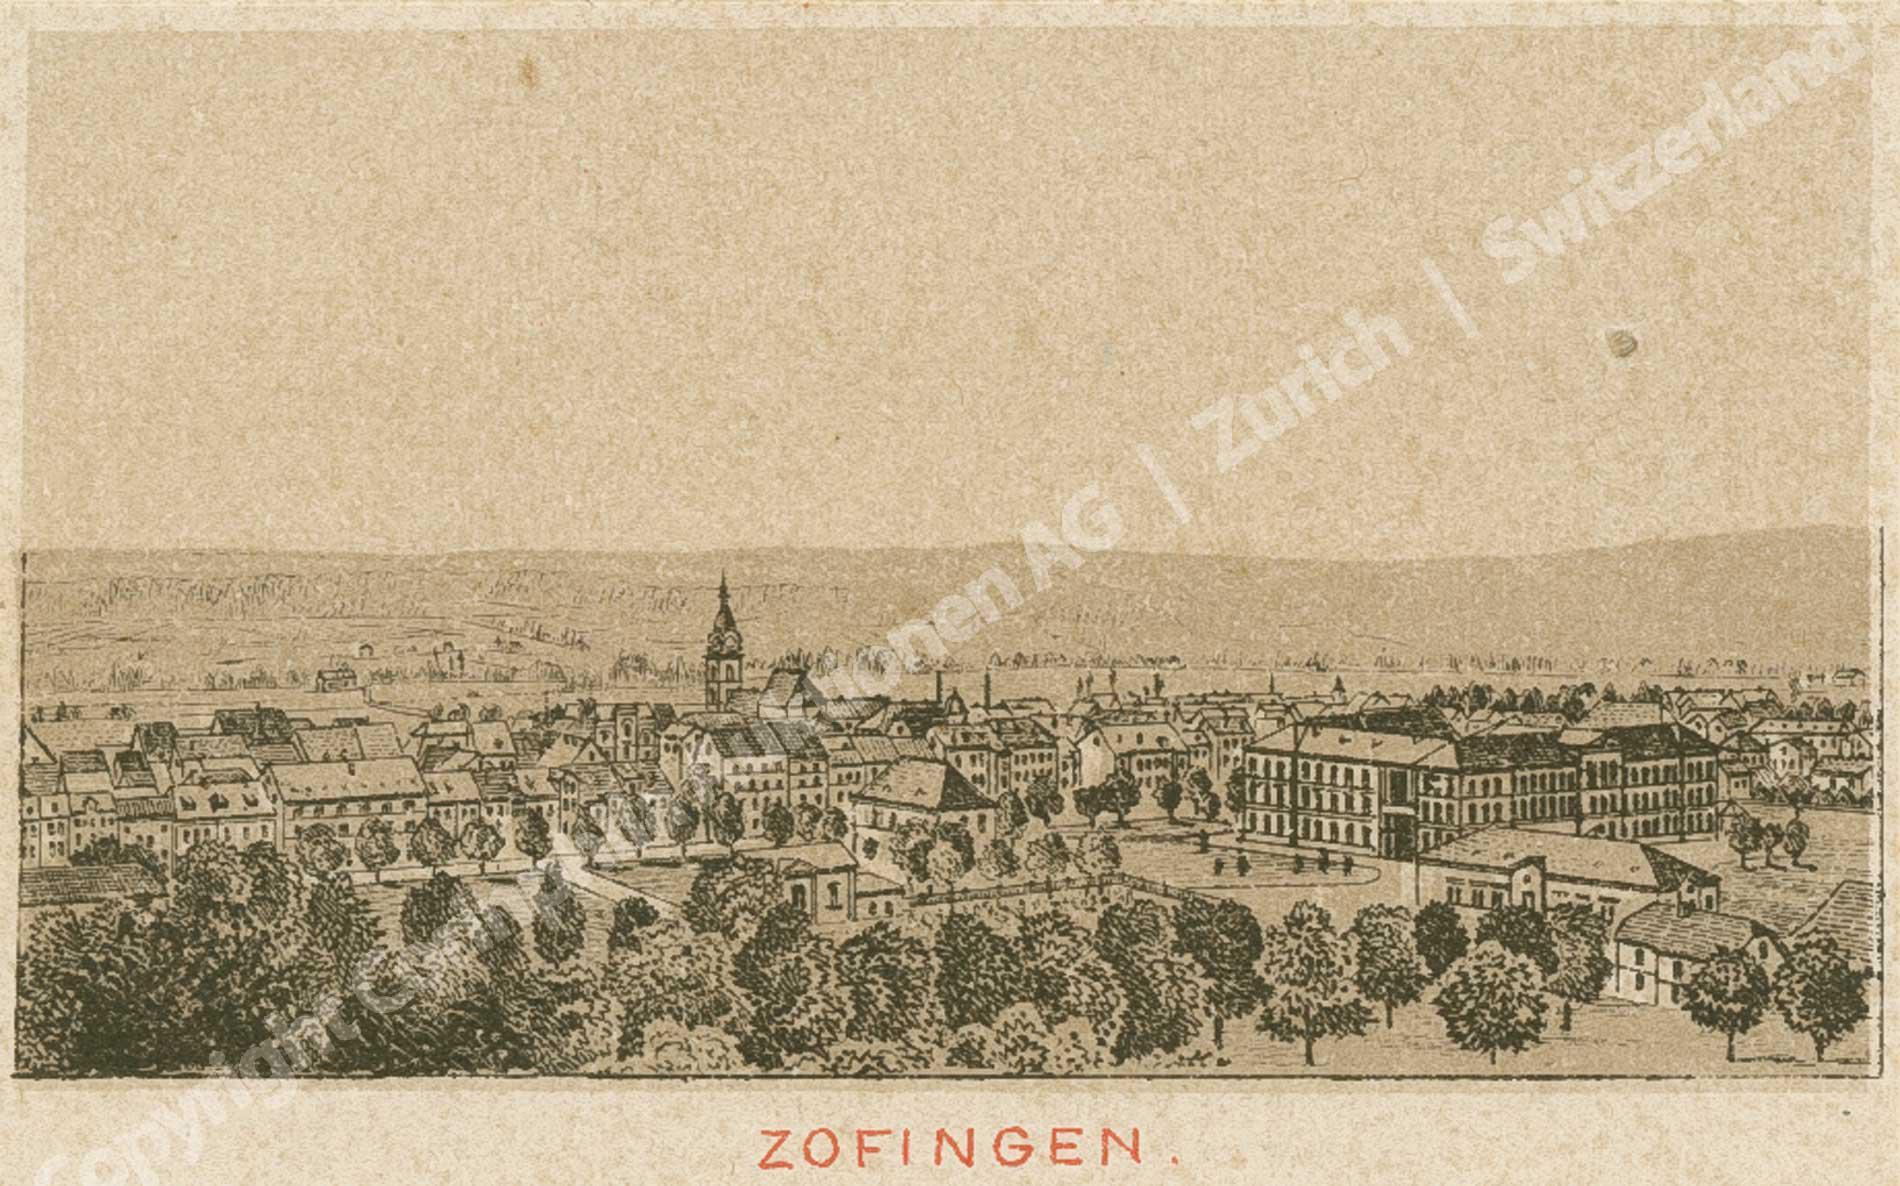 Zofingen